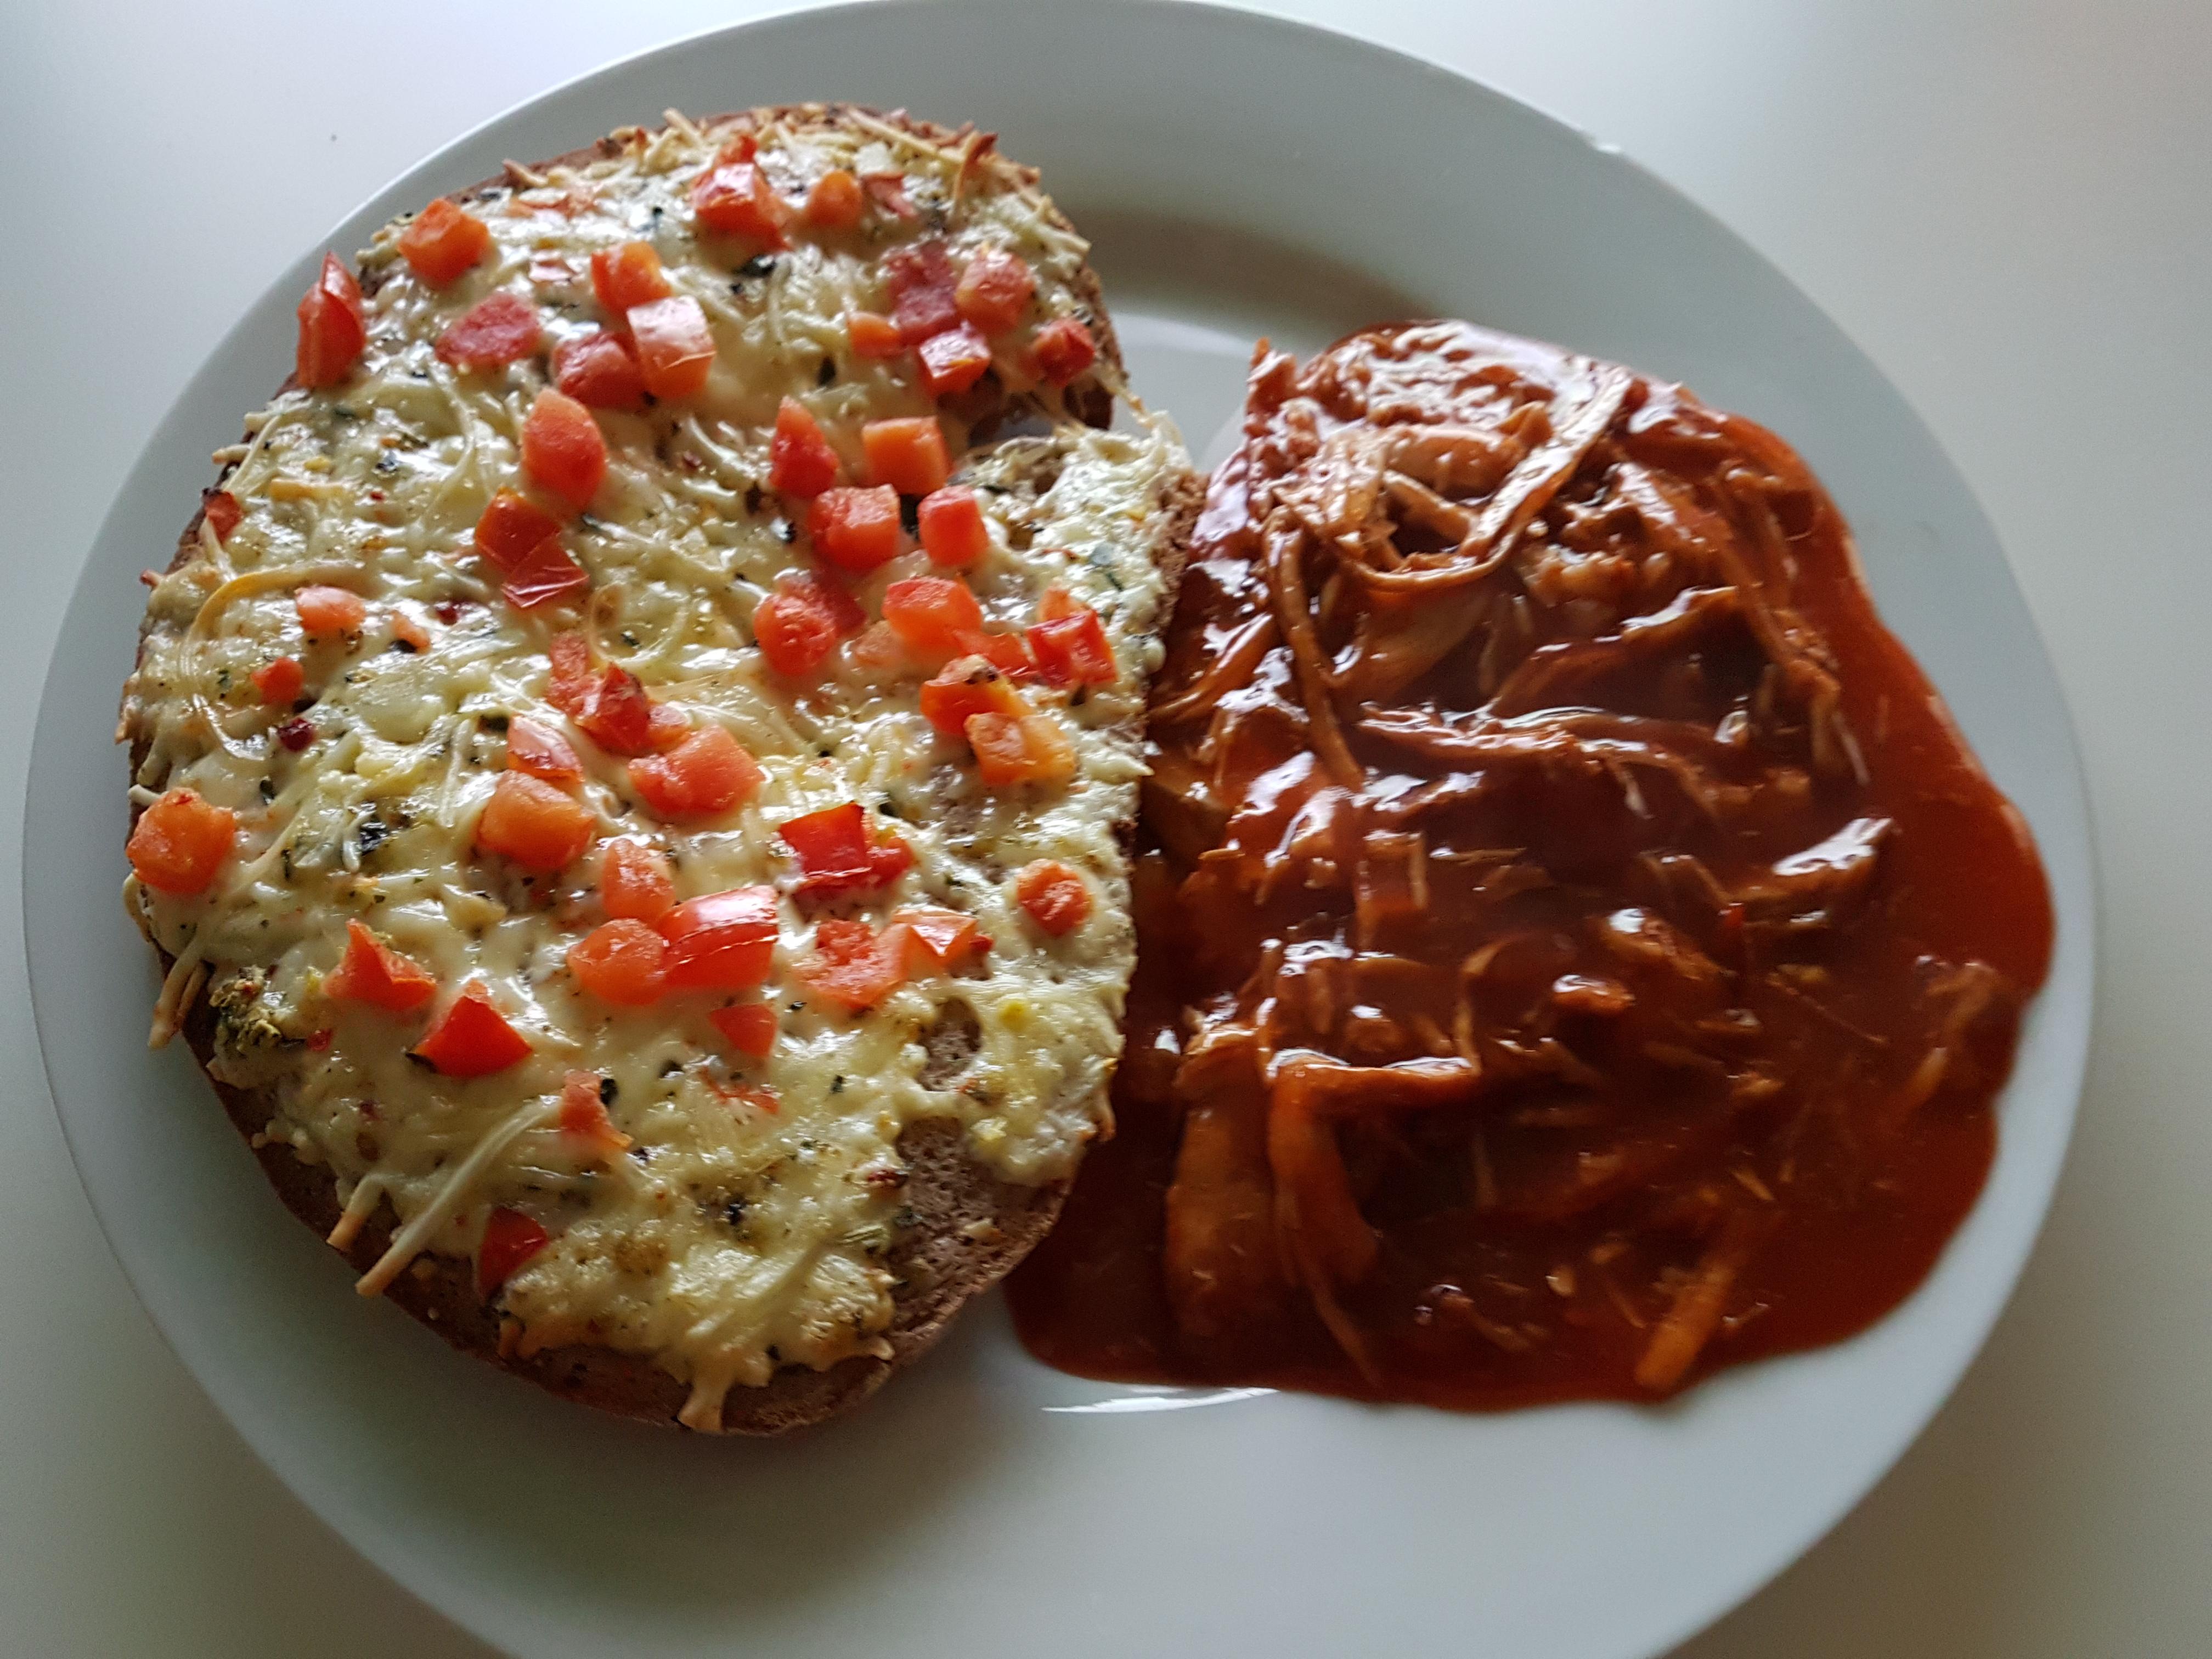 http://foodloader.net/Holz_2018-04-28_Baeckerkruste_und_Pulled_Pork.jpg